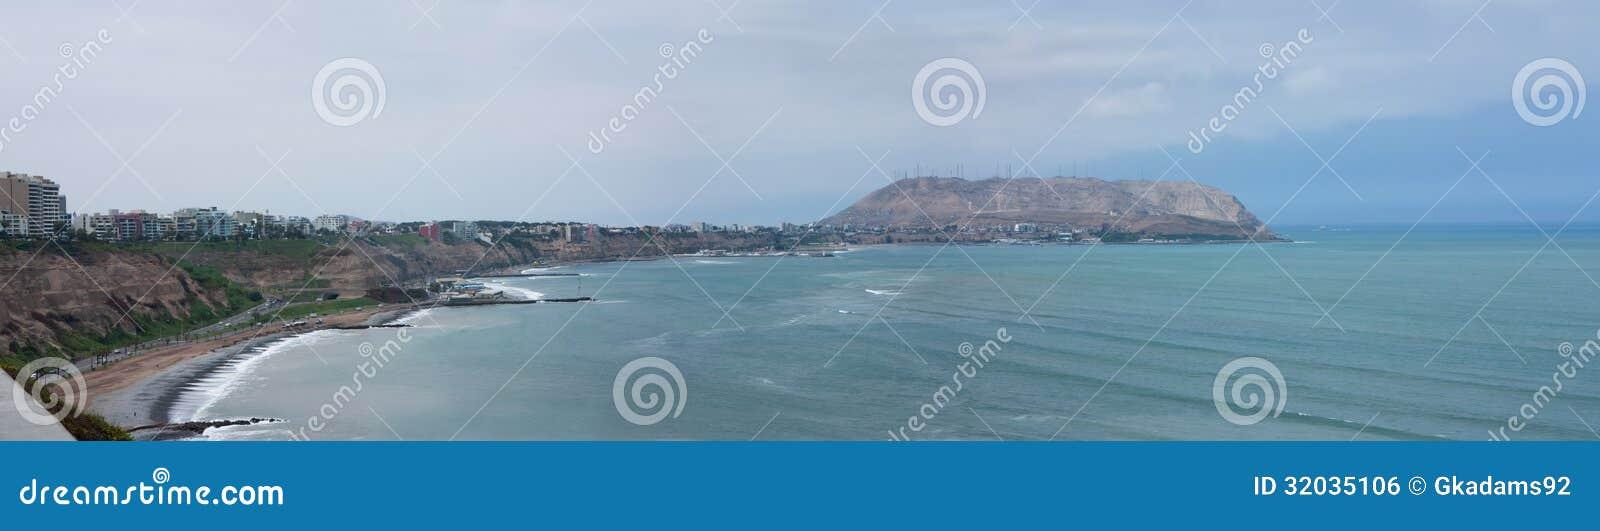 Lima Peru Beach Resort District